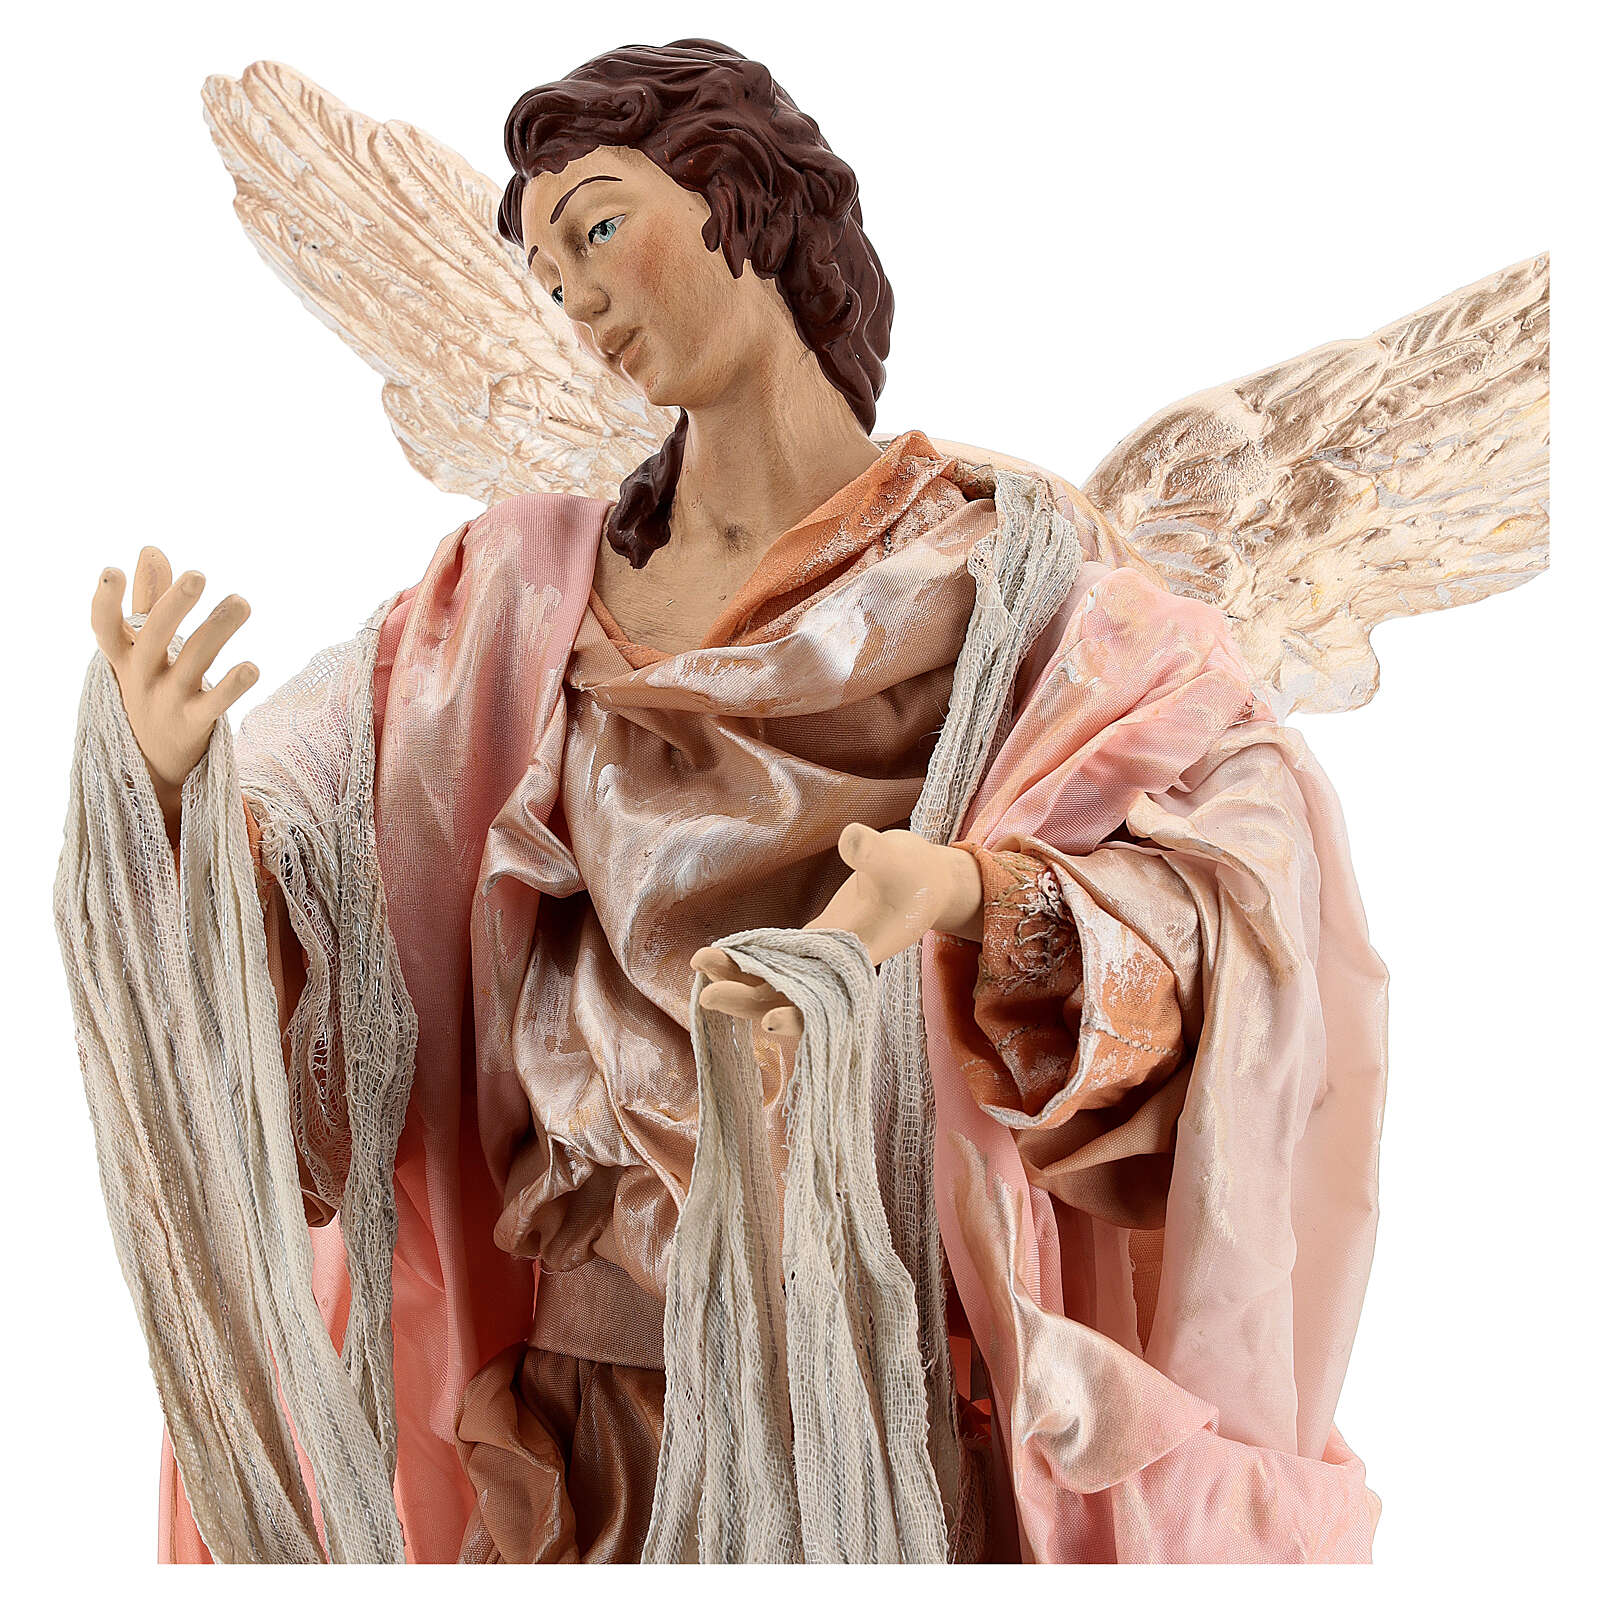 Angelo moro piedistallo legno terracotta 45 cm presepe napoletano 4